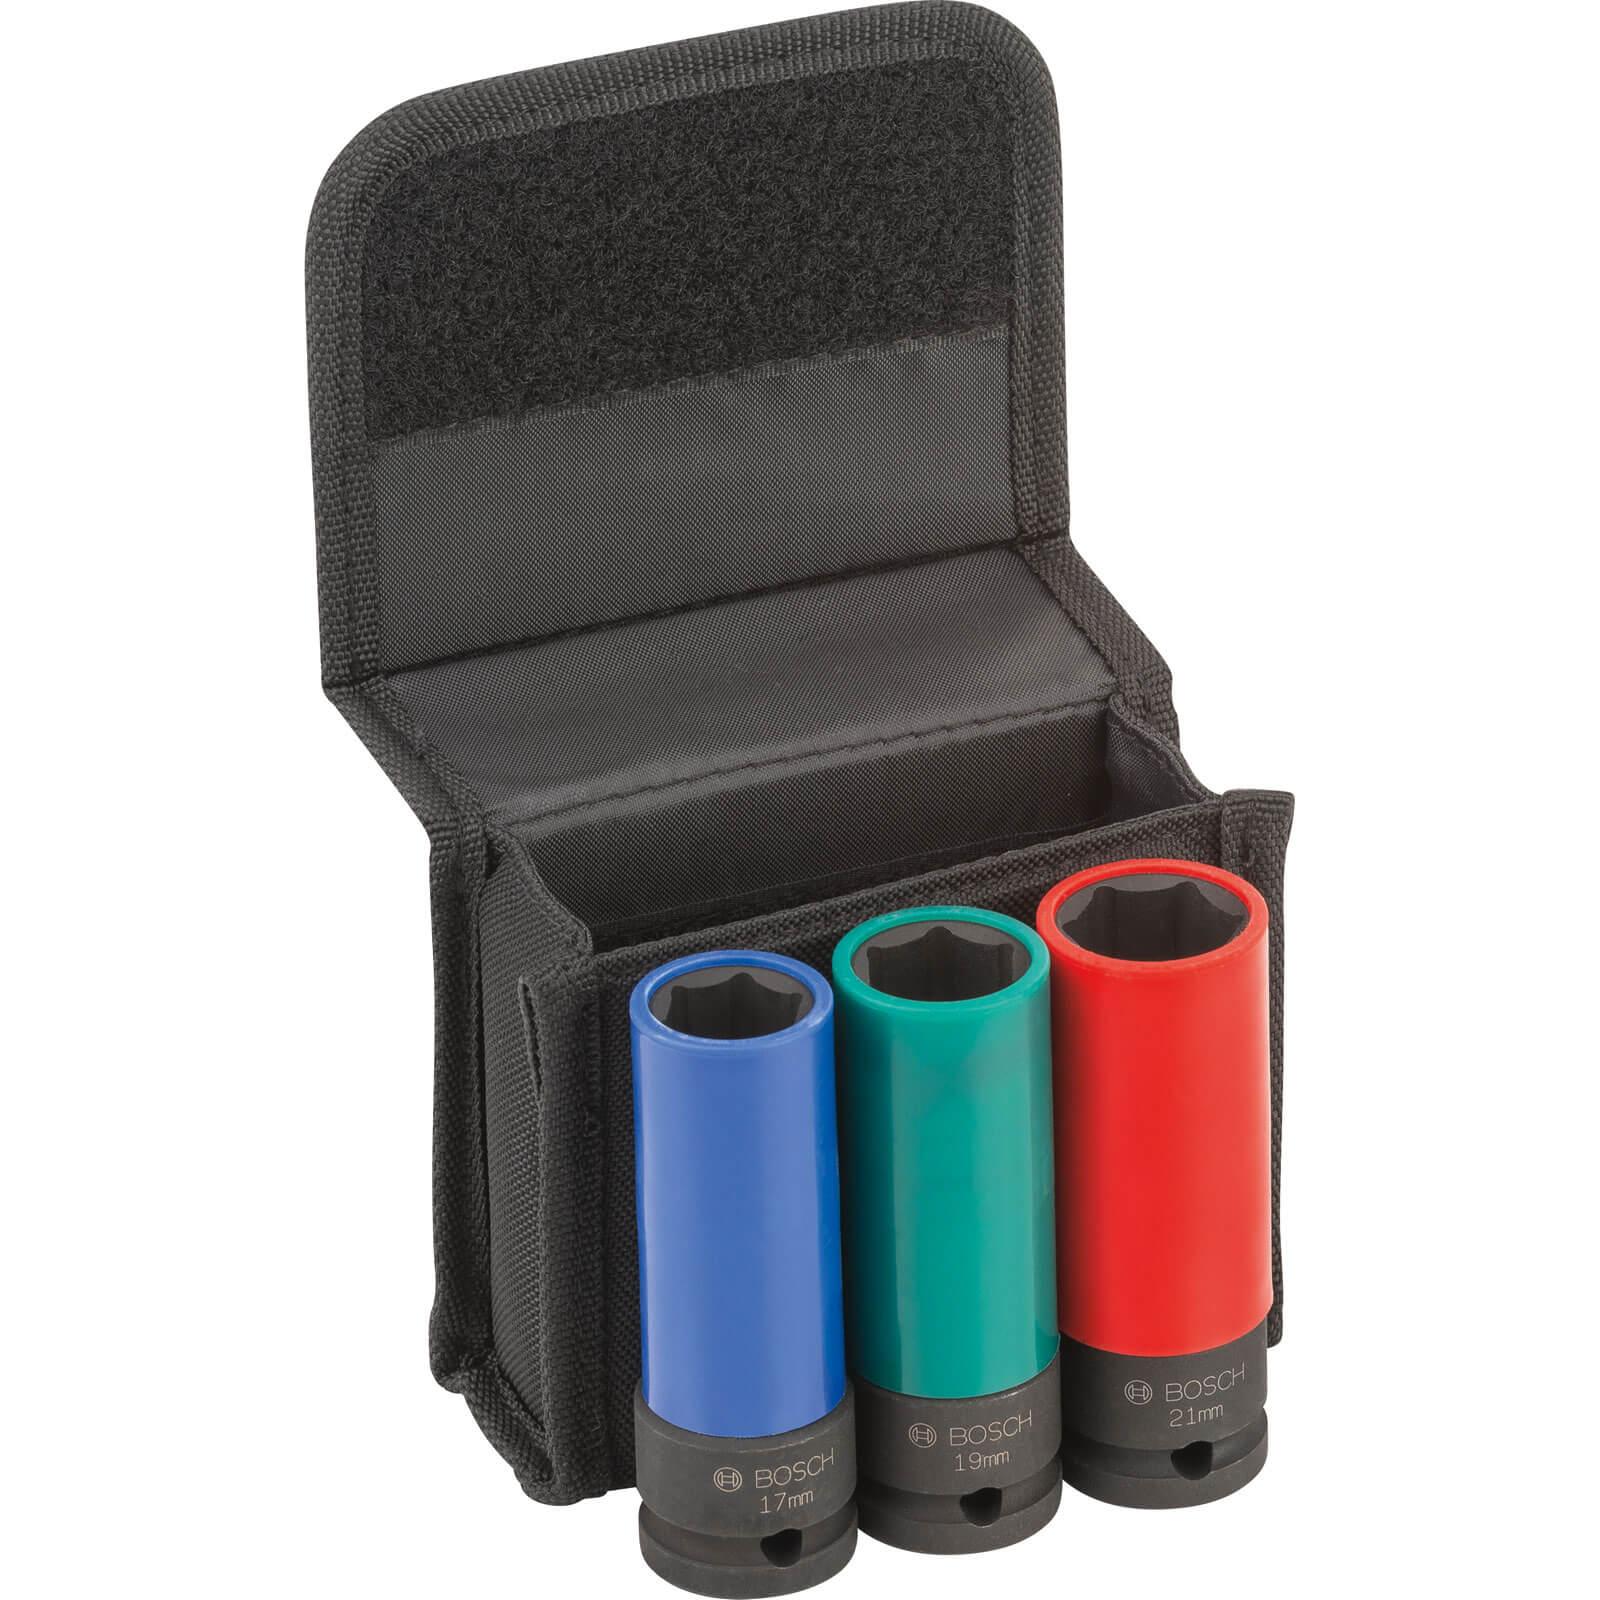 "Bosch 3 Piece 1/2"" Drive PVC Sleeved Hexagon Impact Socket Set Metric 1/2"""